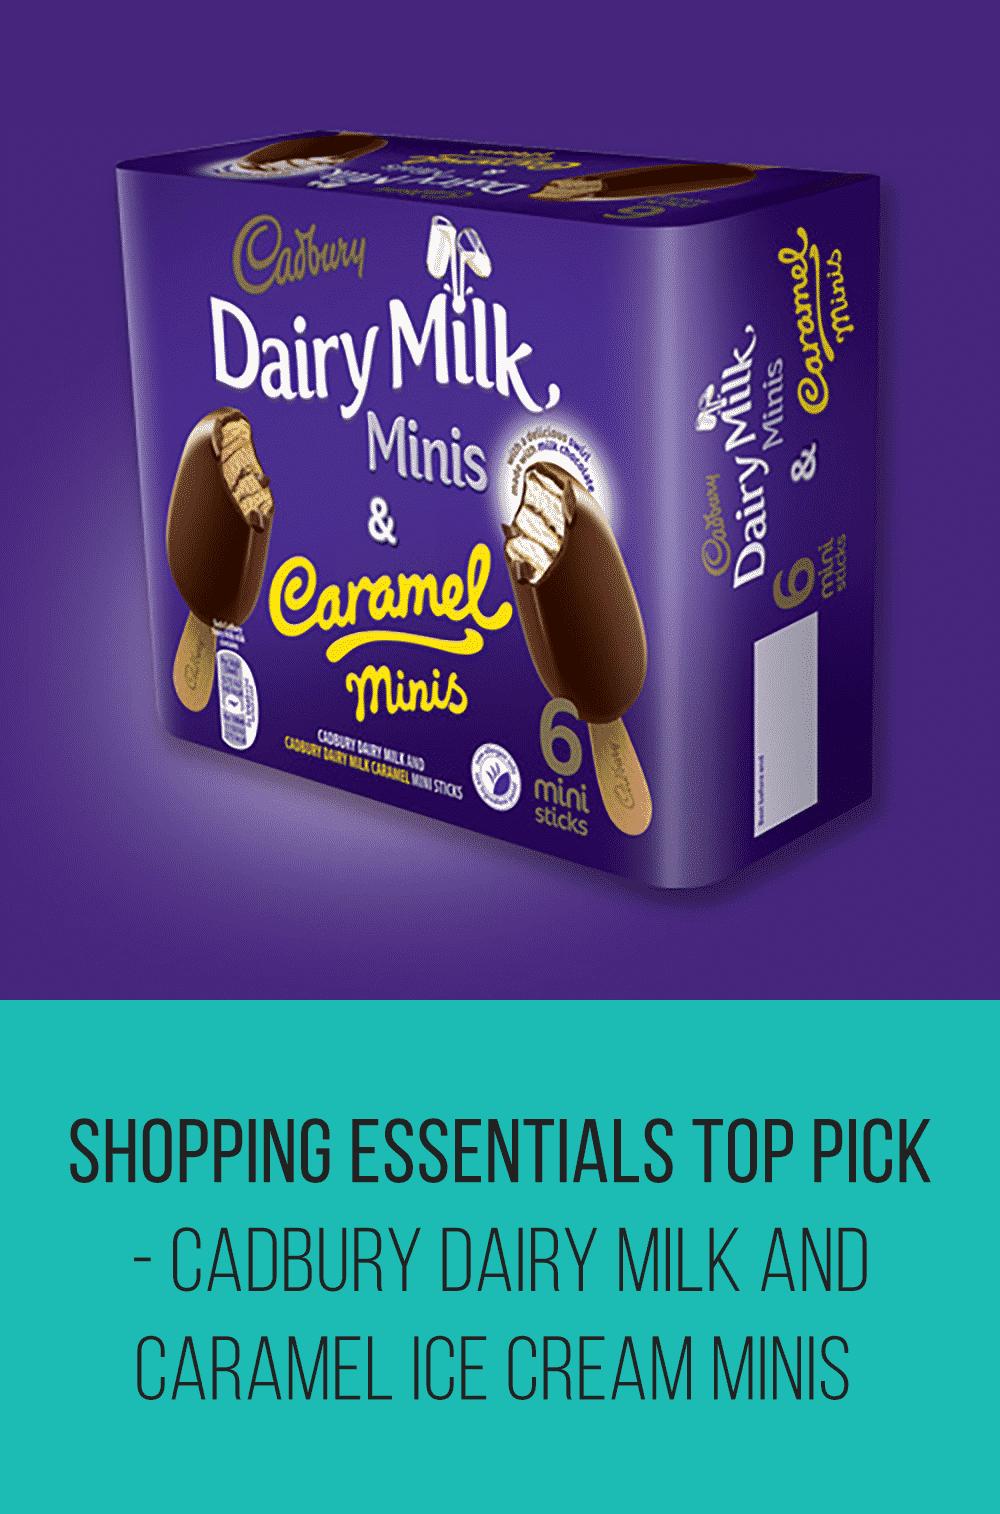 Slimming World Shopping Essentials